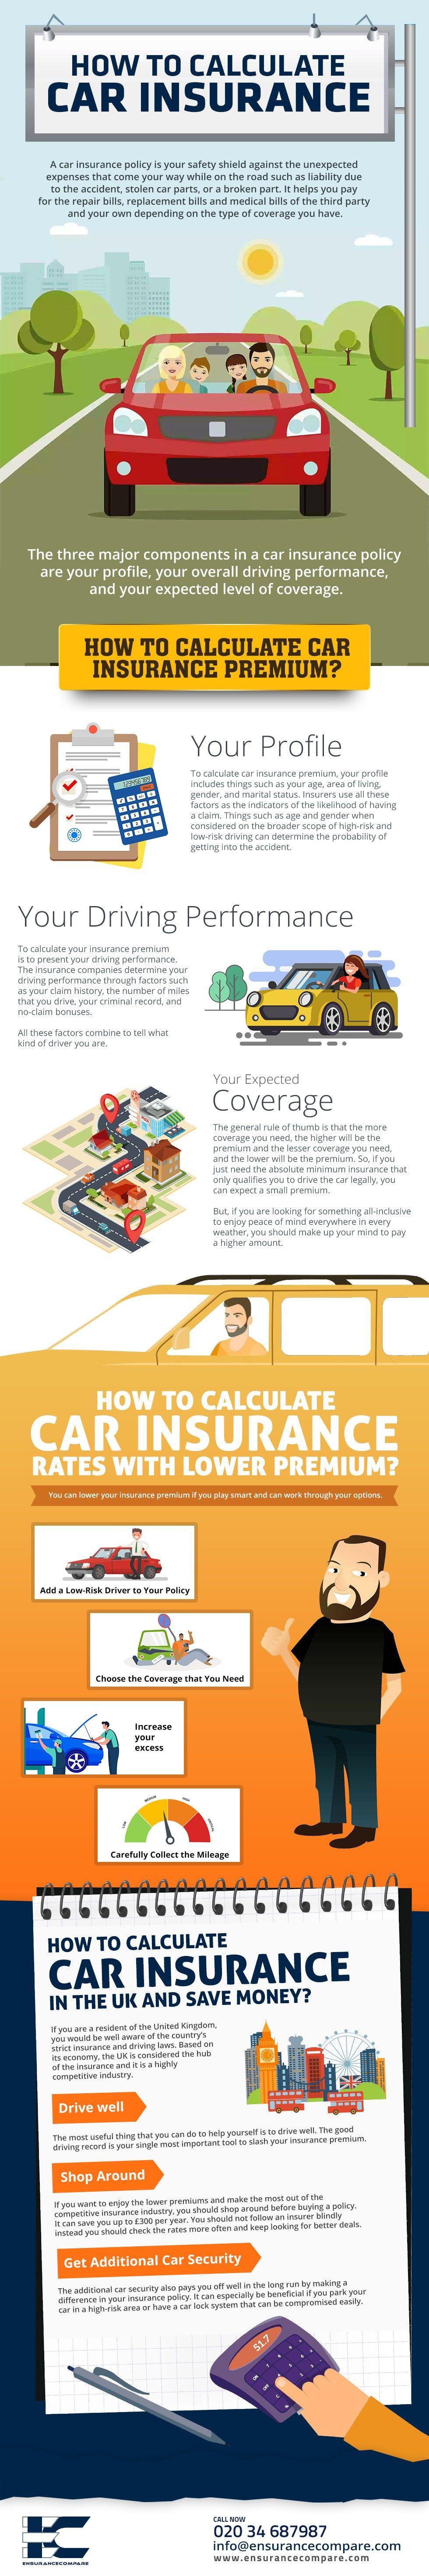 How to Calculate Car Insurance Car insurance, Car